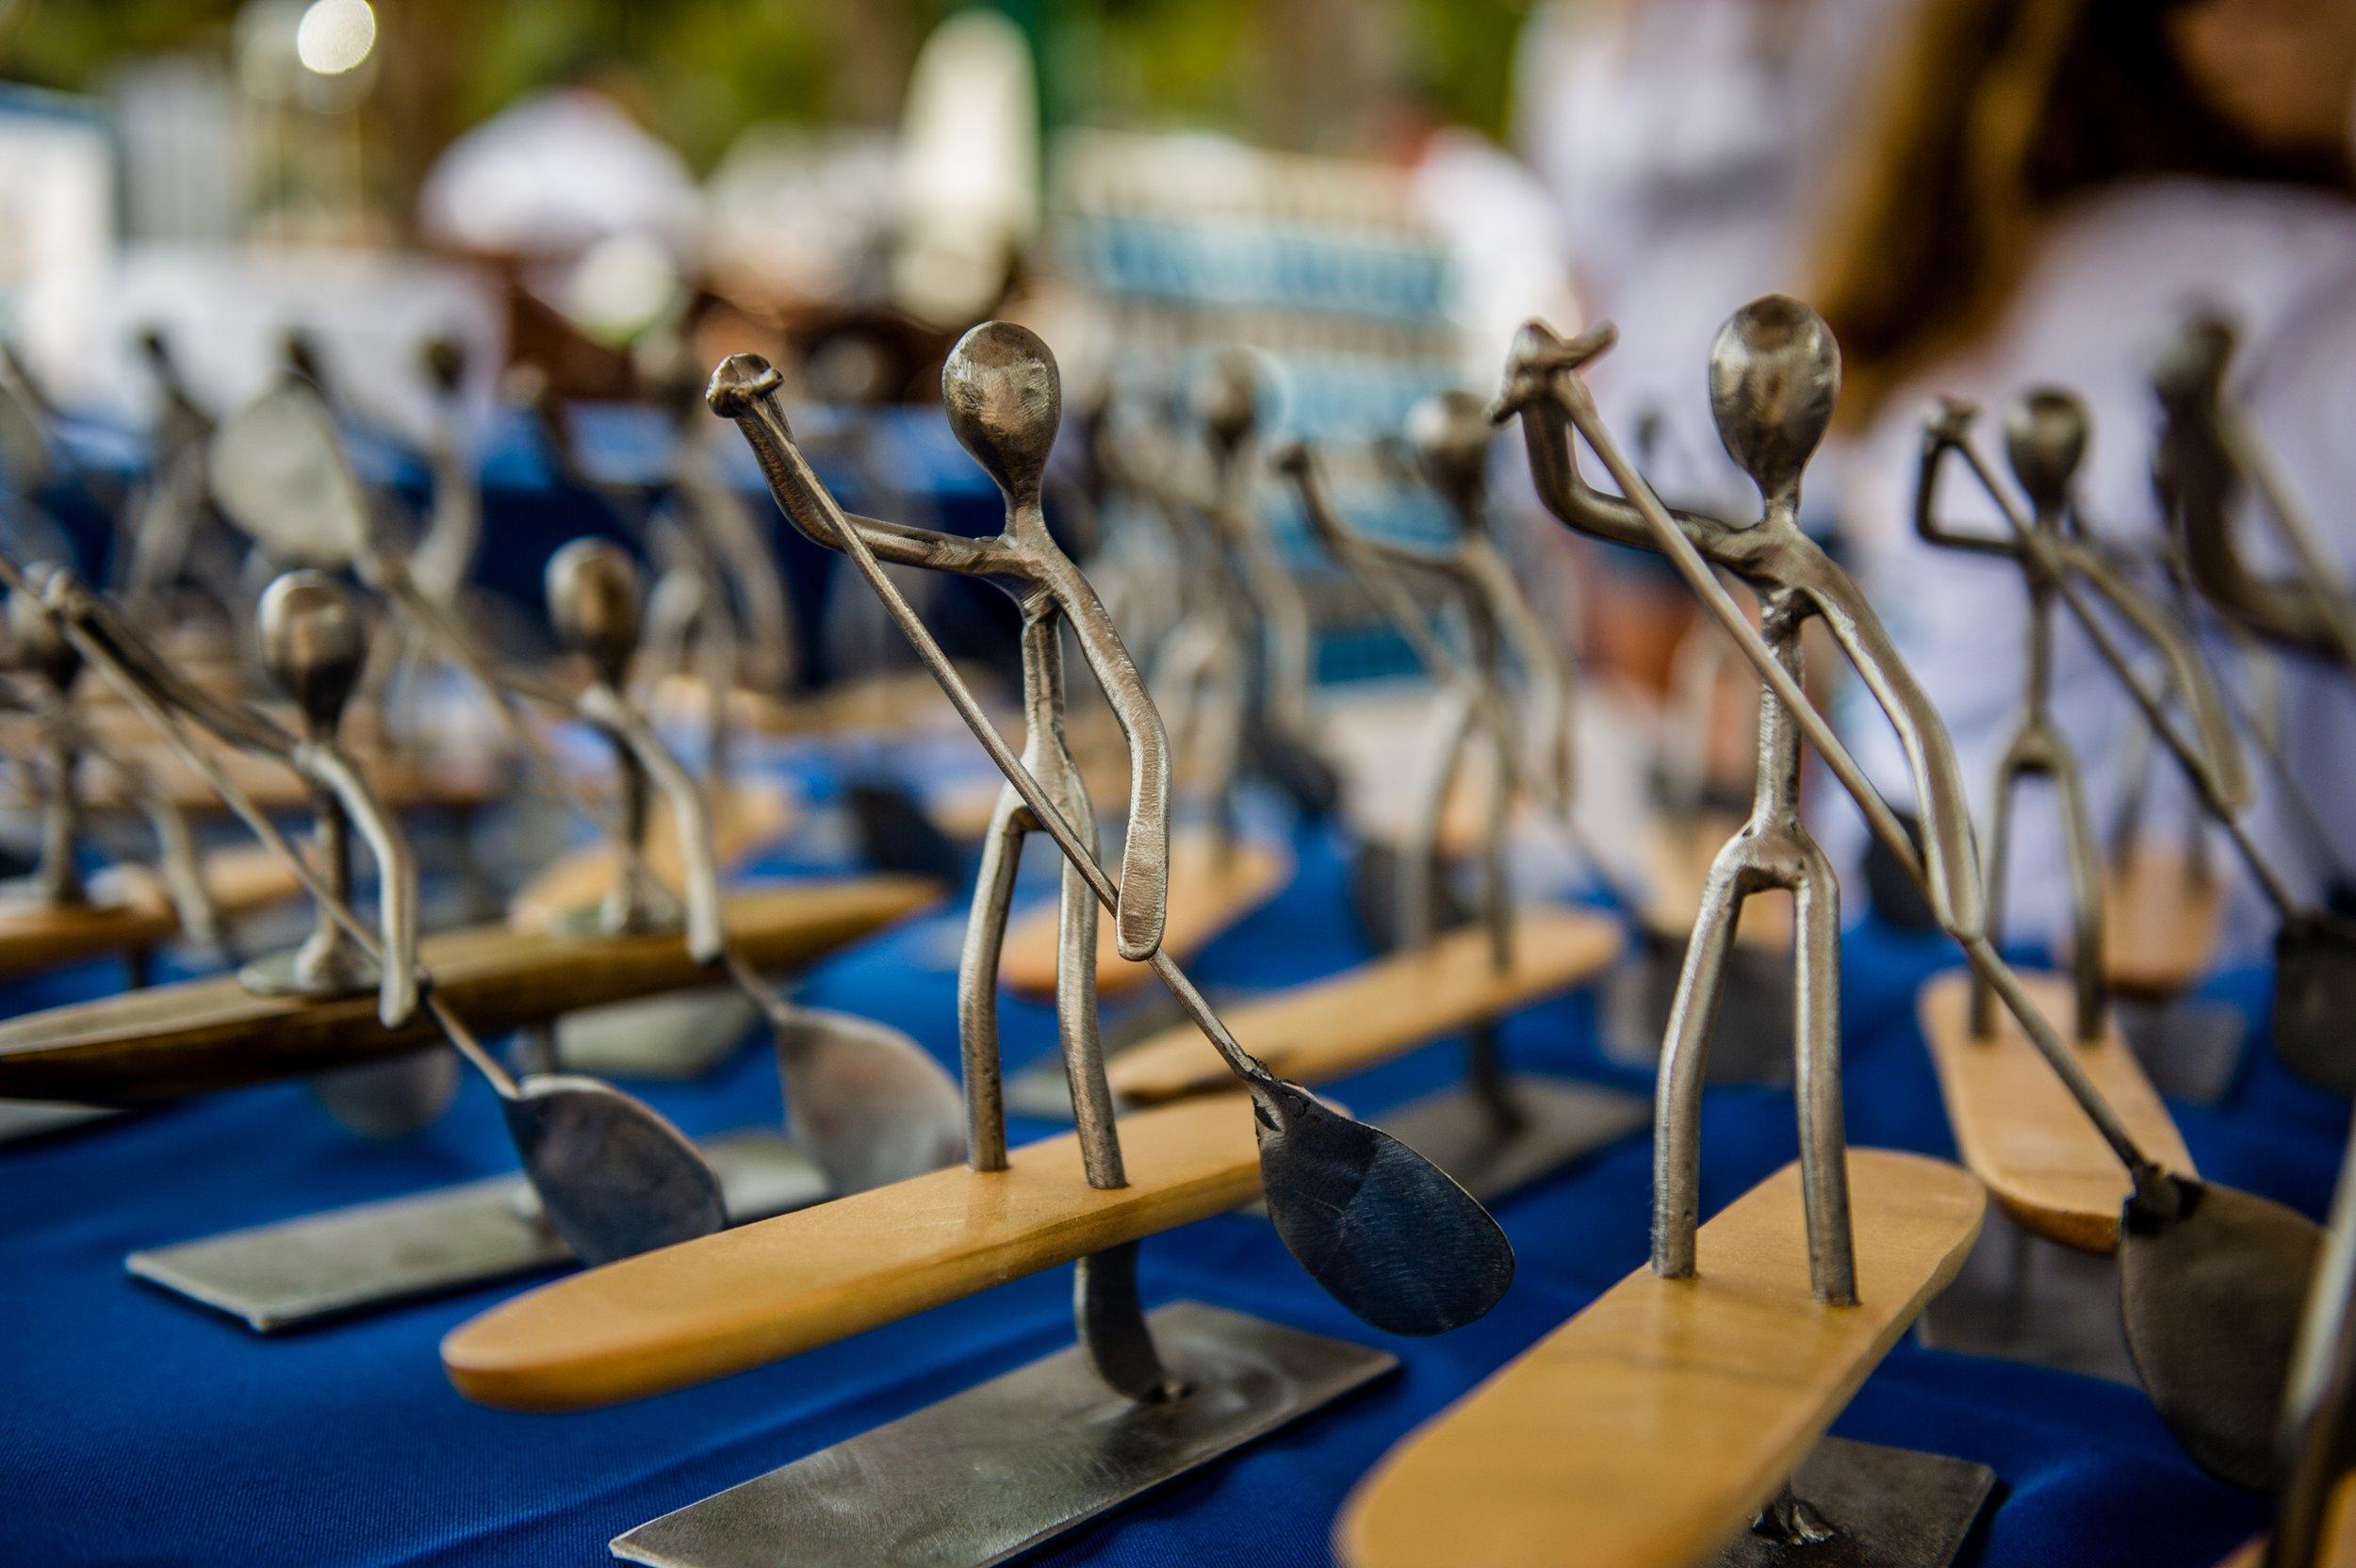 Award Ceremony Trophies